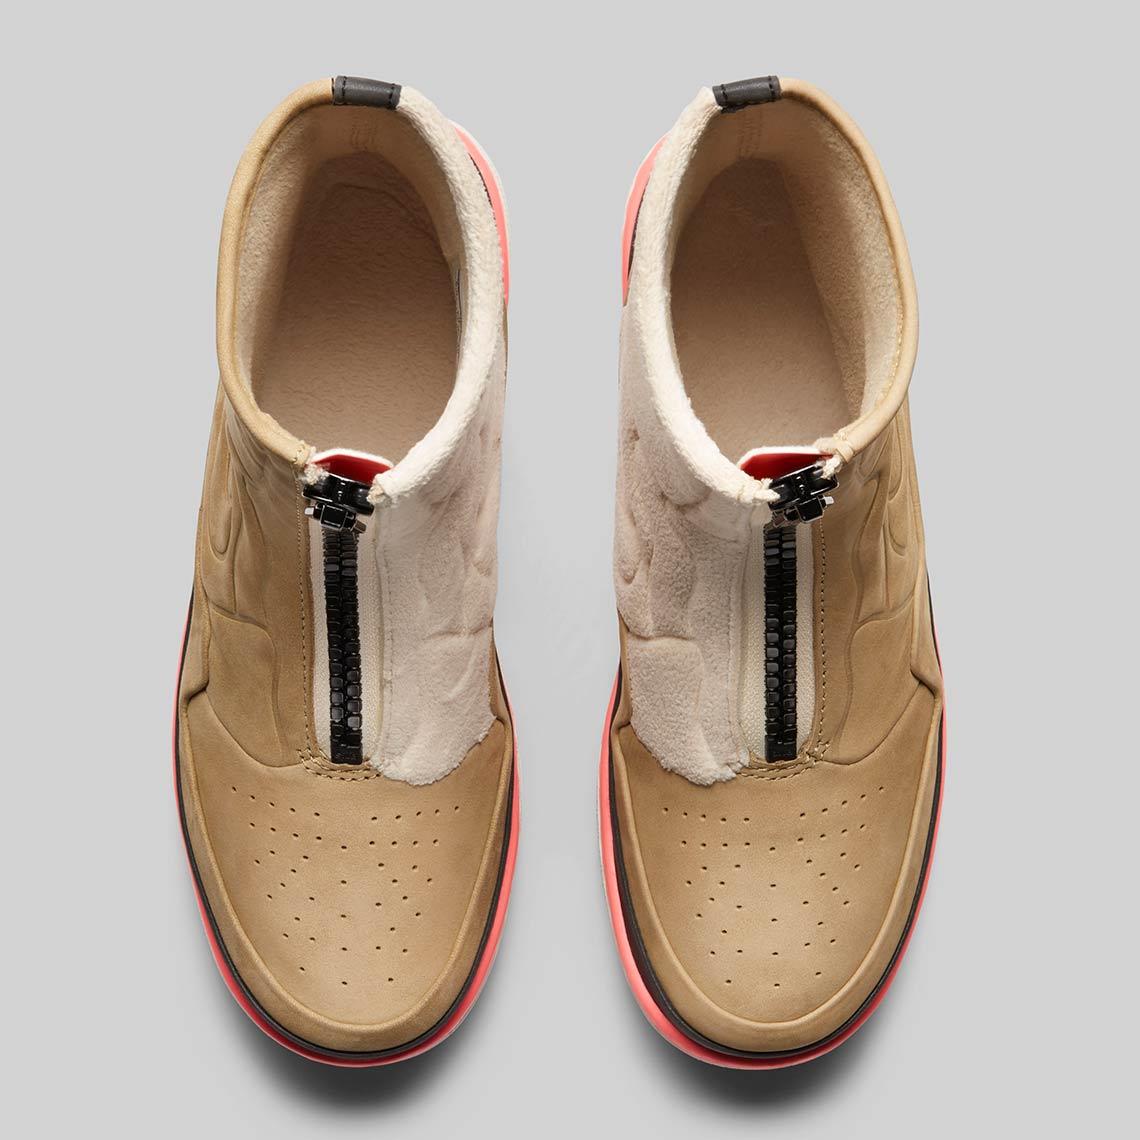 Air Jordan 1 Utility Pack Womens Release Info  5c843d533